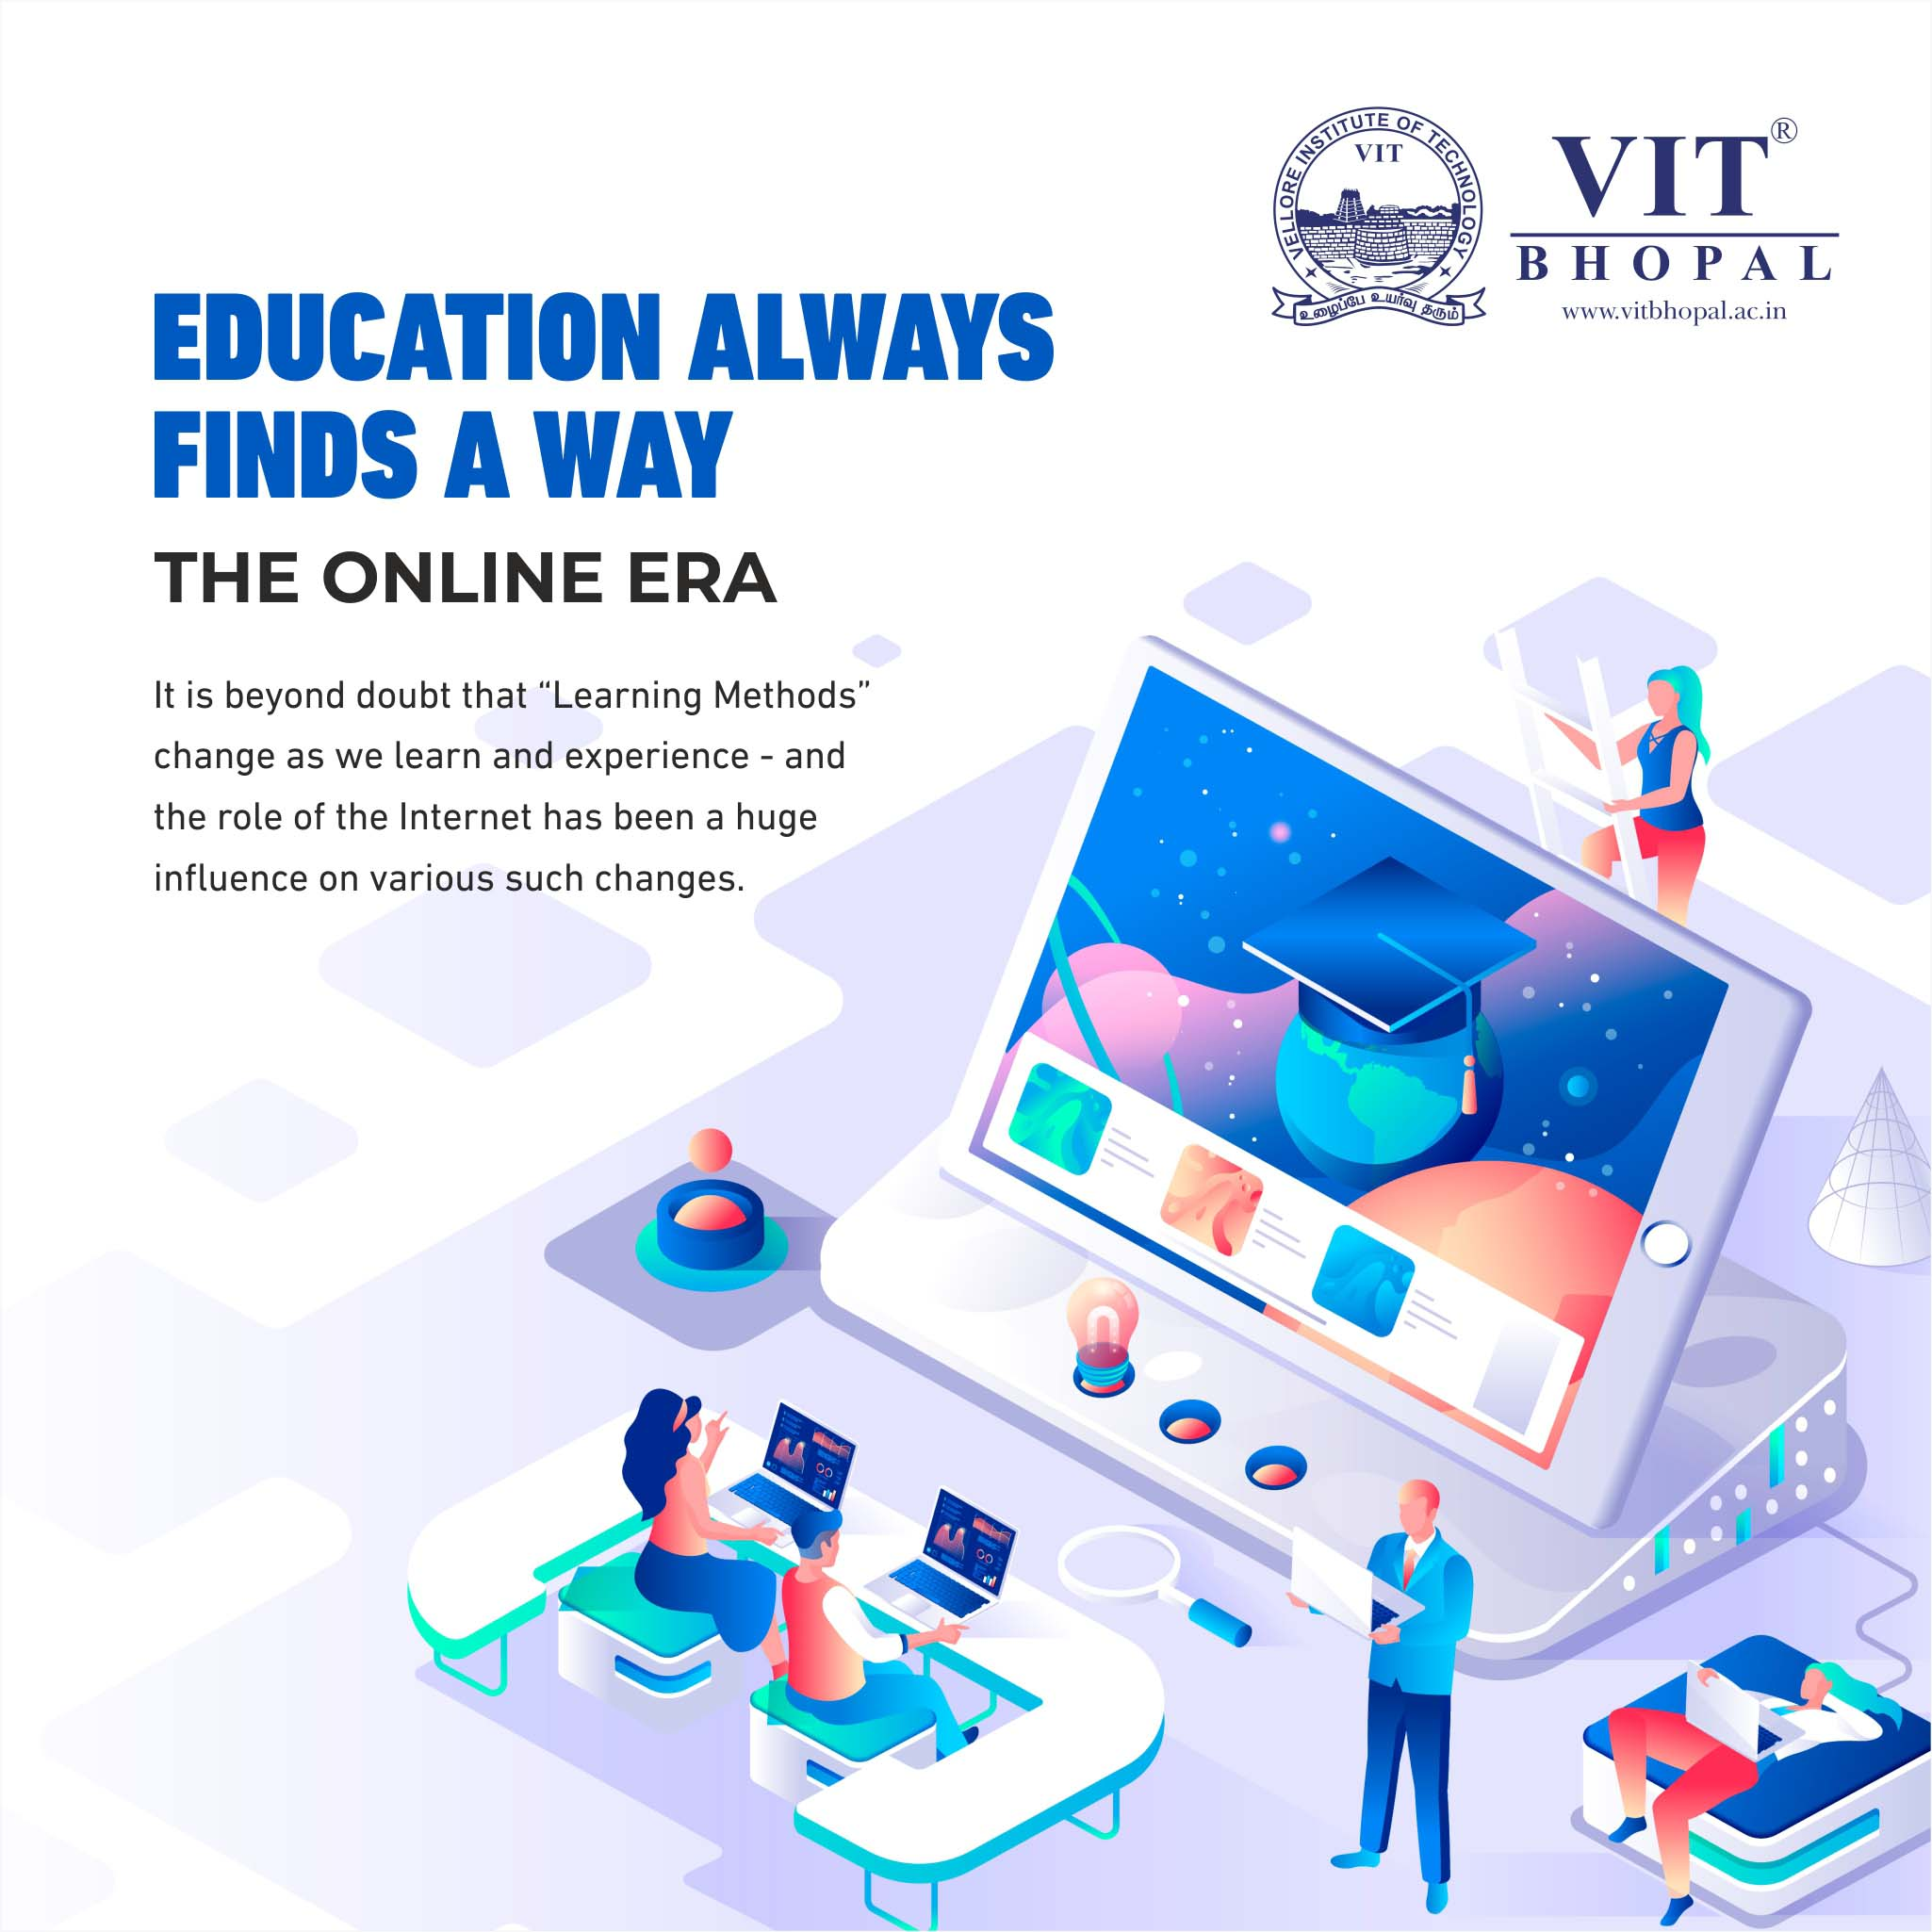 VIT Bhopal  - Best University in Central India -  Online-Classes-Blog